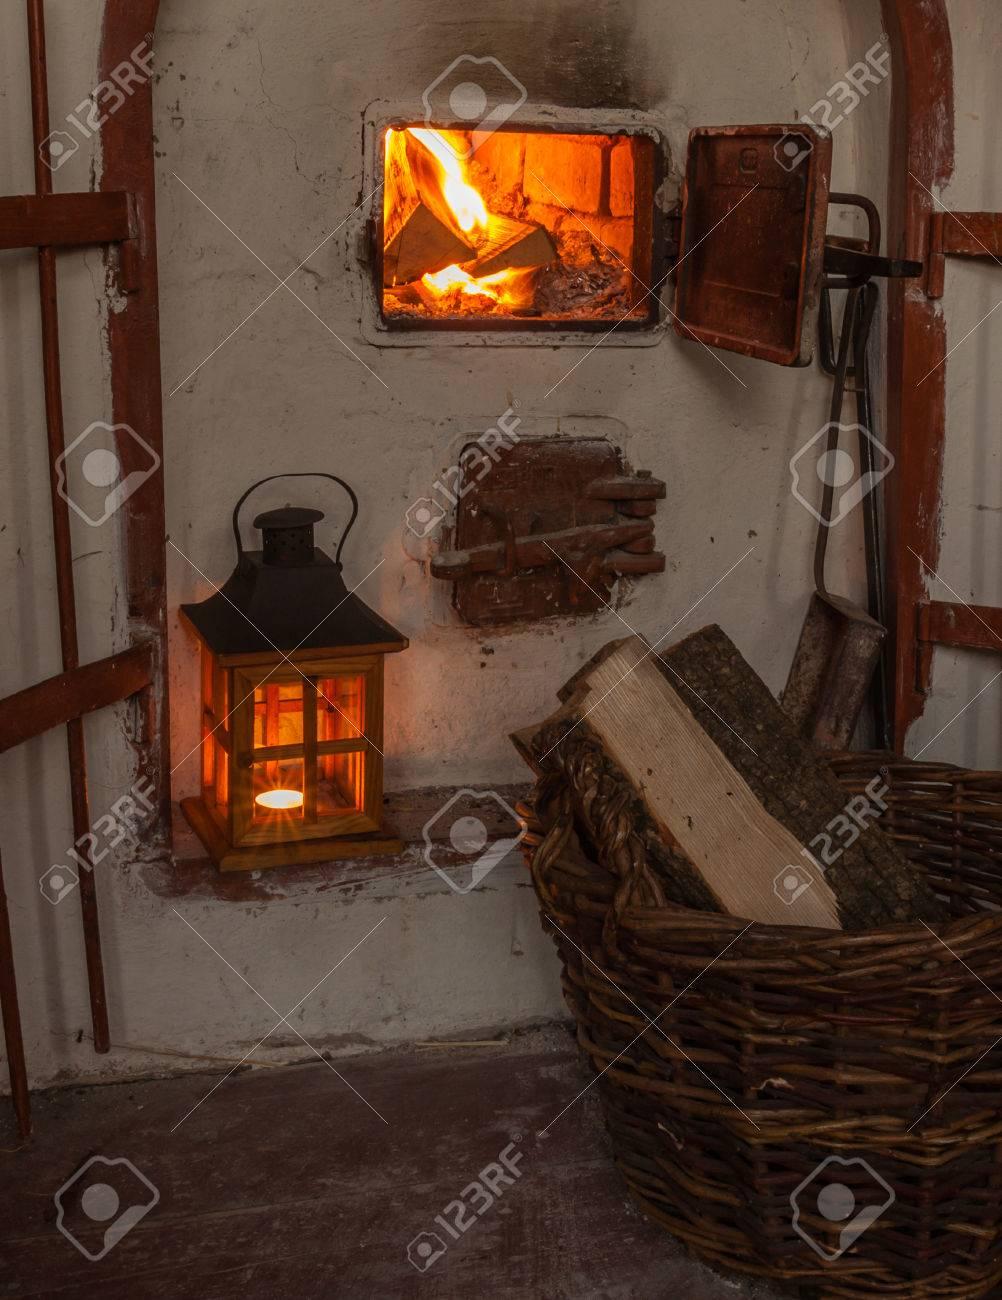 lantern near an open fireplace and a basket of firewood stock